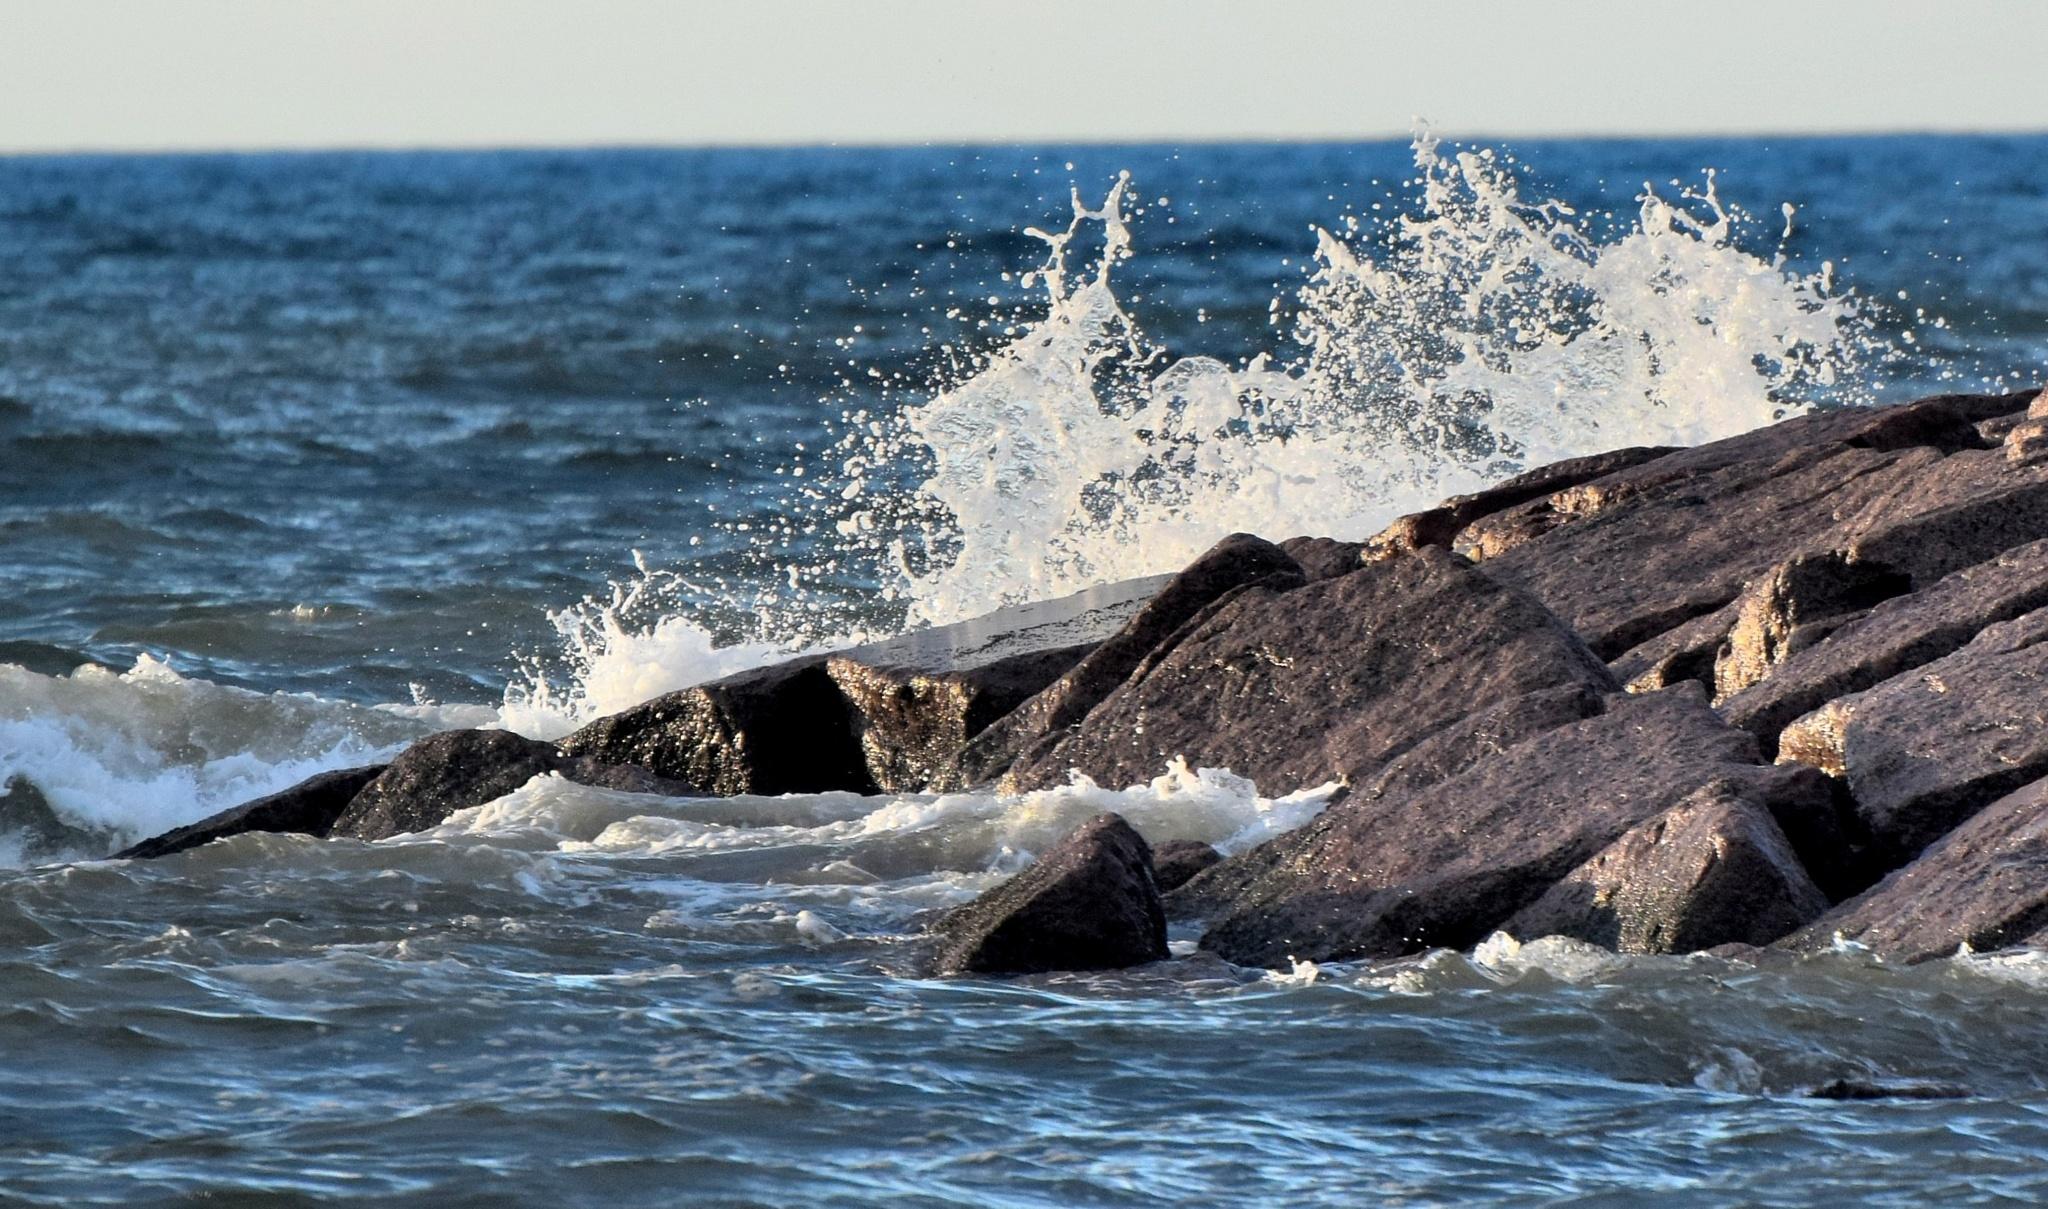 Galveston Tx 282~Crashing Waves 5 by Lawrence Scott Hess